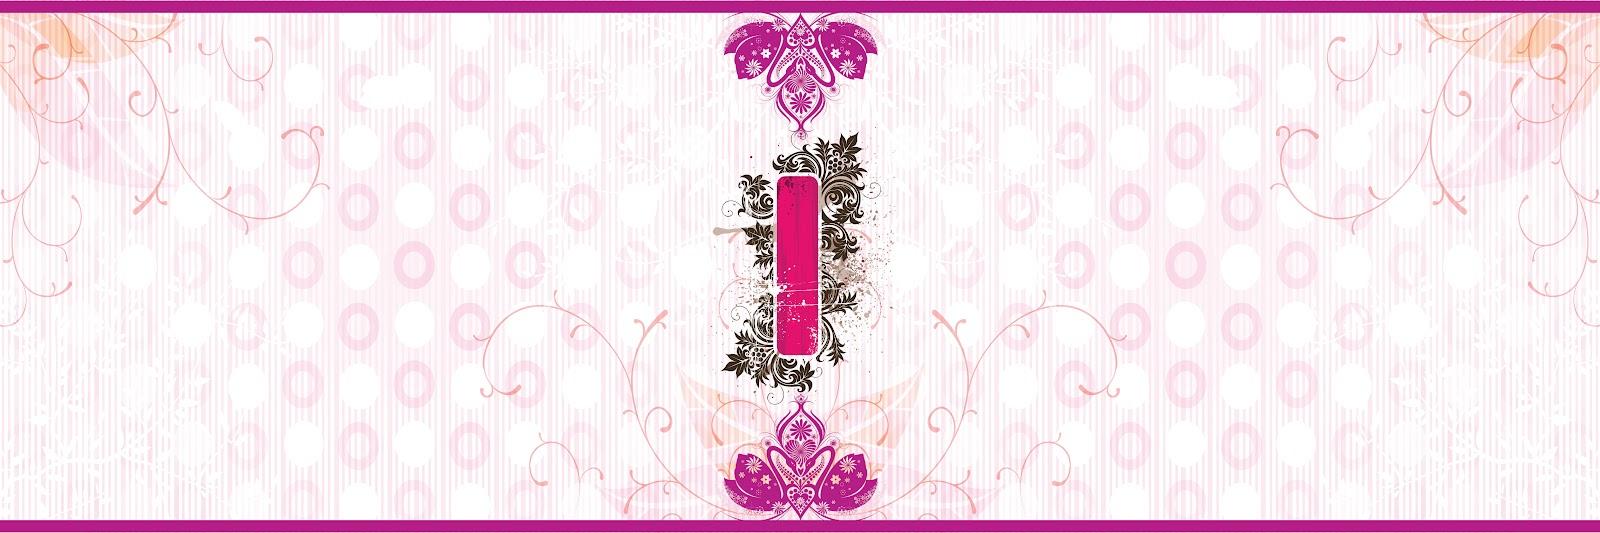 Wedding album design psd free download wedding album software wedding